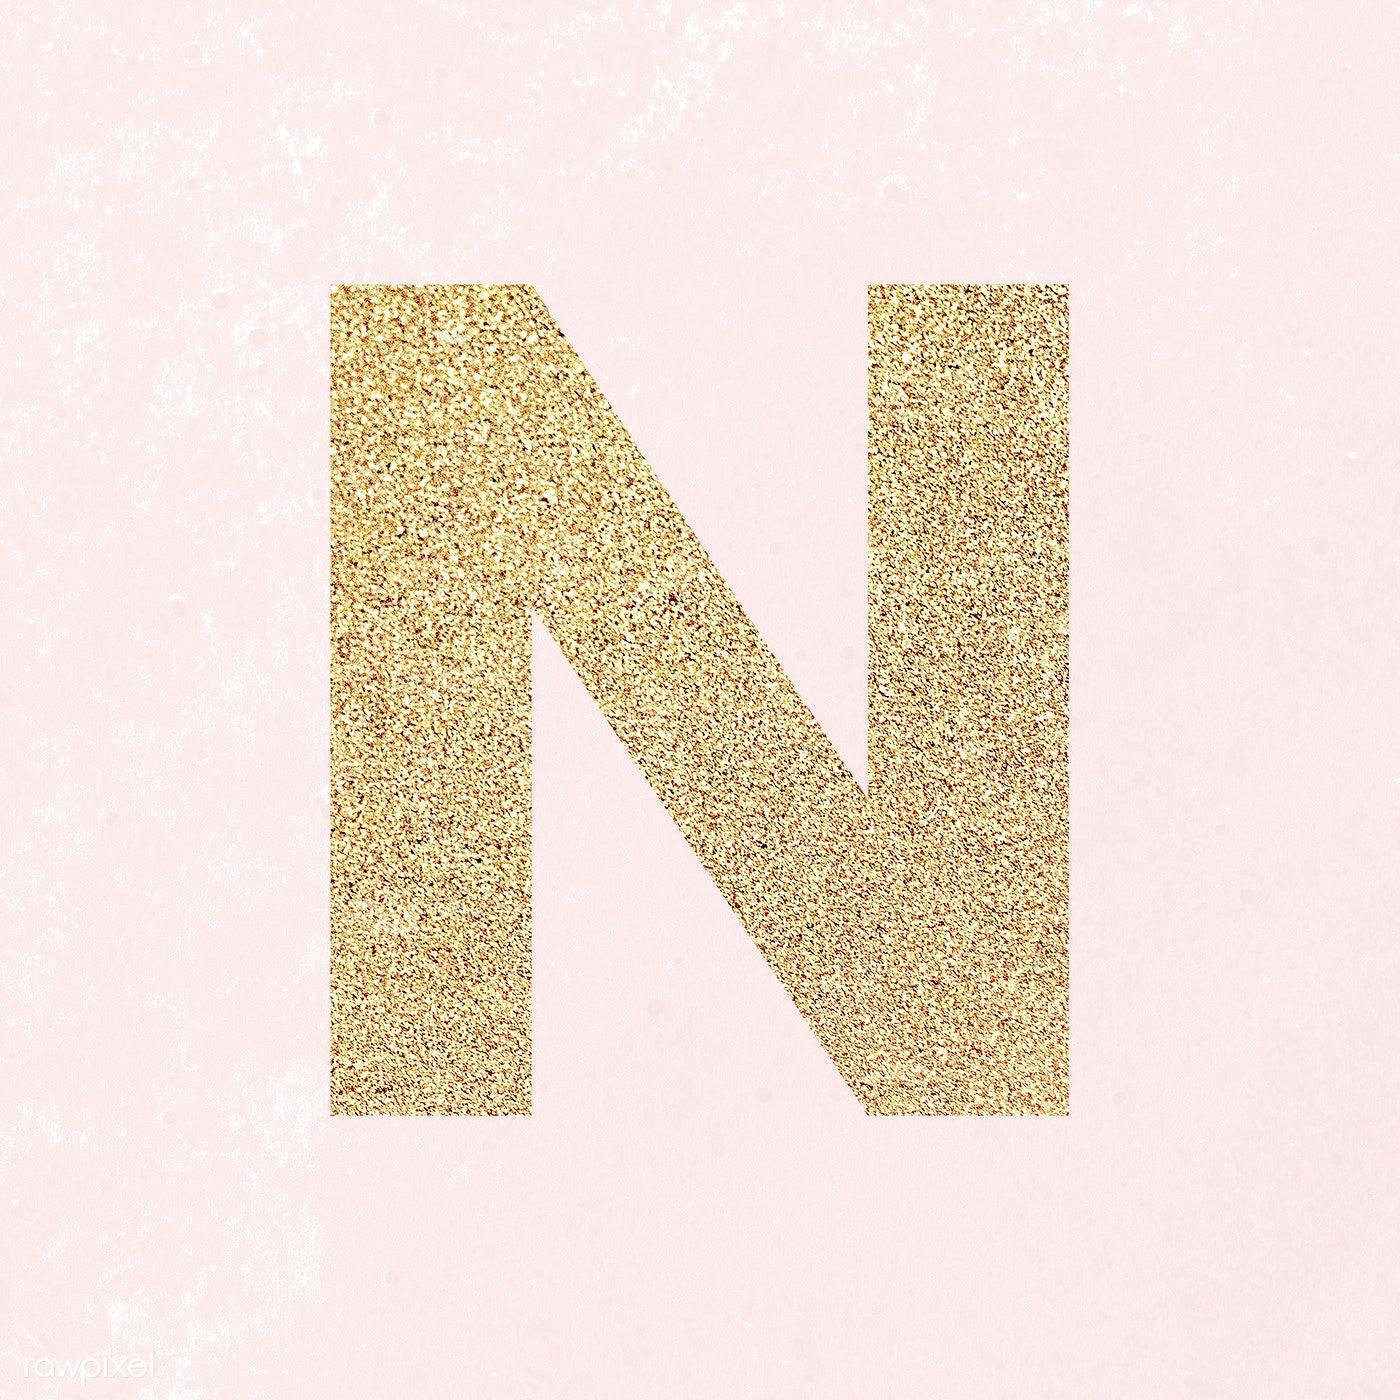 Glitter Capital Letter N Sticker Illustration Free Image By Rawpixel Com Ningzk V Letter N Lettering Numbers Typography